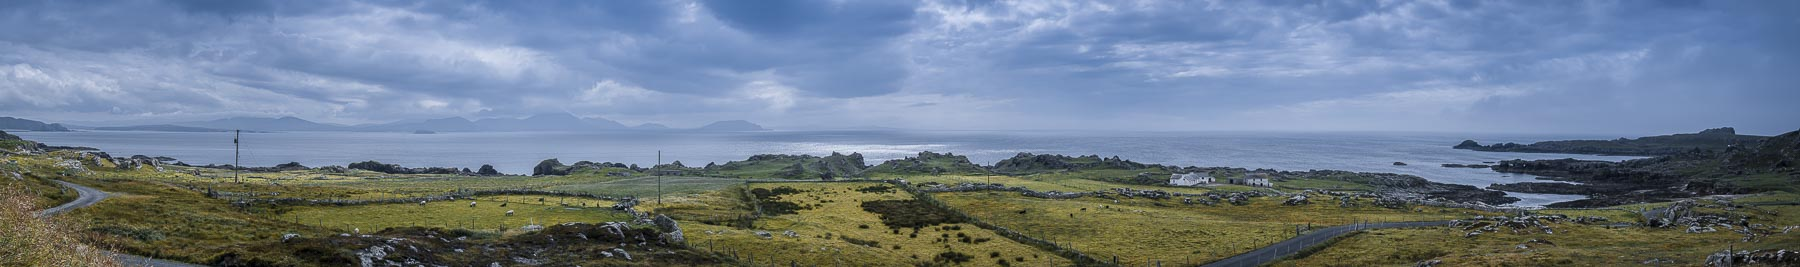 Ballyhillin, County Donegal, Ireland